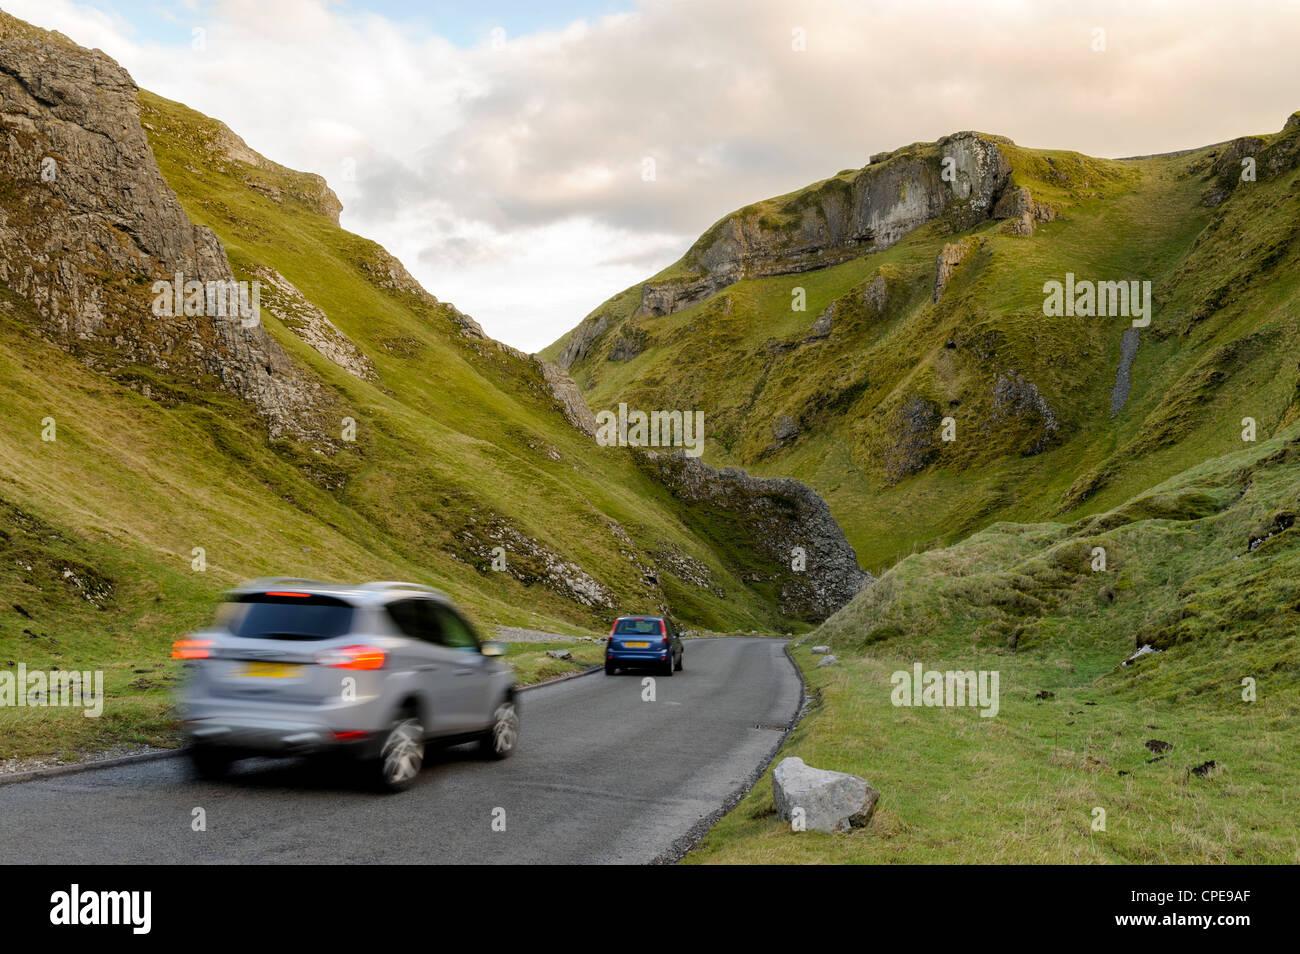 Cars travelling down Winnats Pass, Castleton, Peak District National Park, Derbyshire, England, United Kingdom, - Stock Image